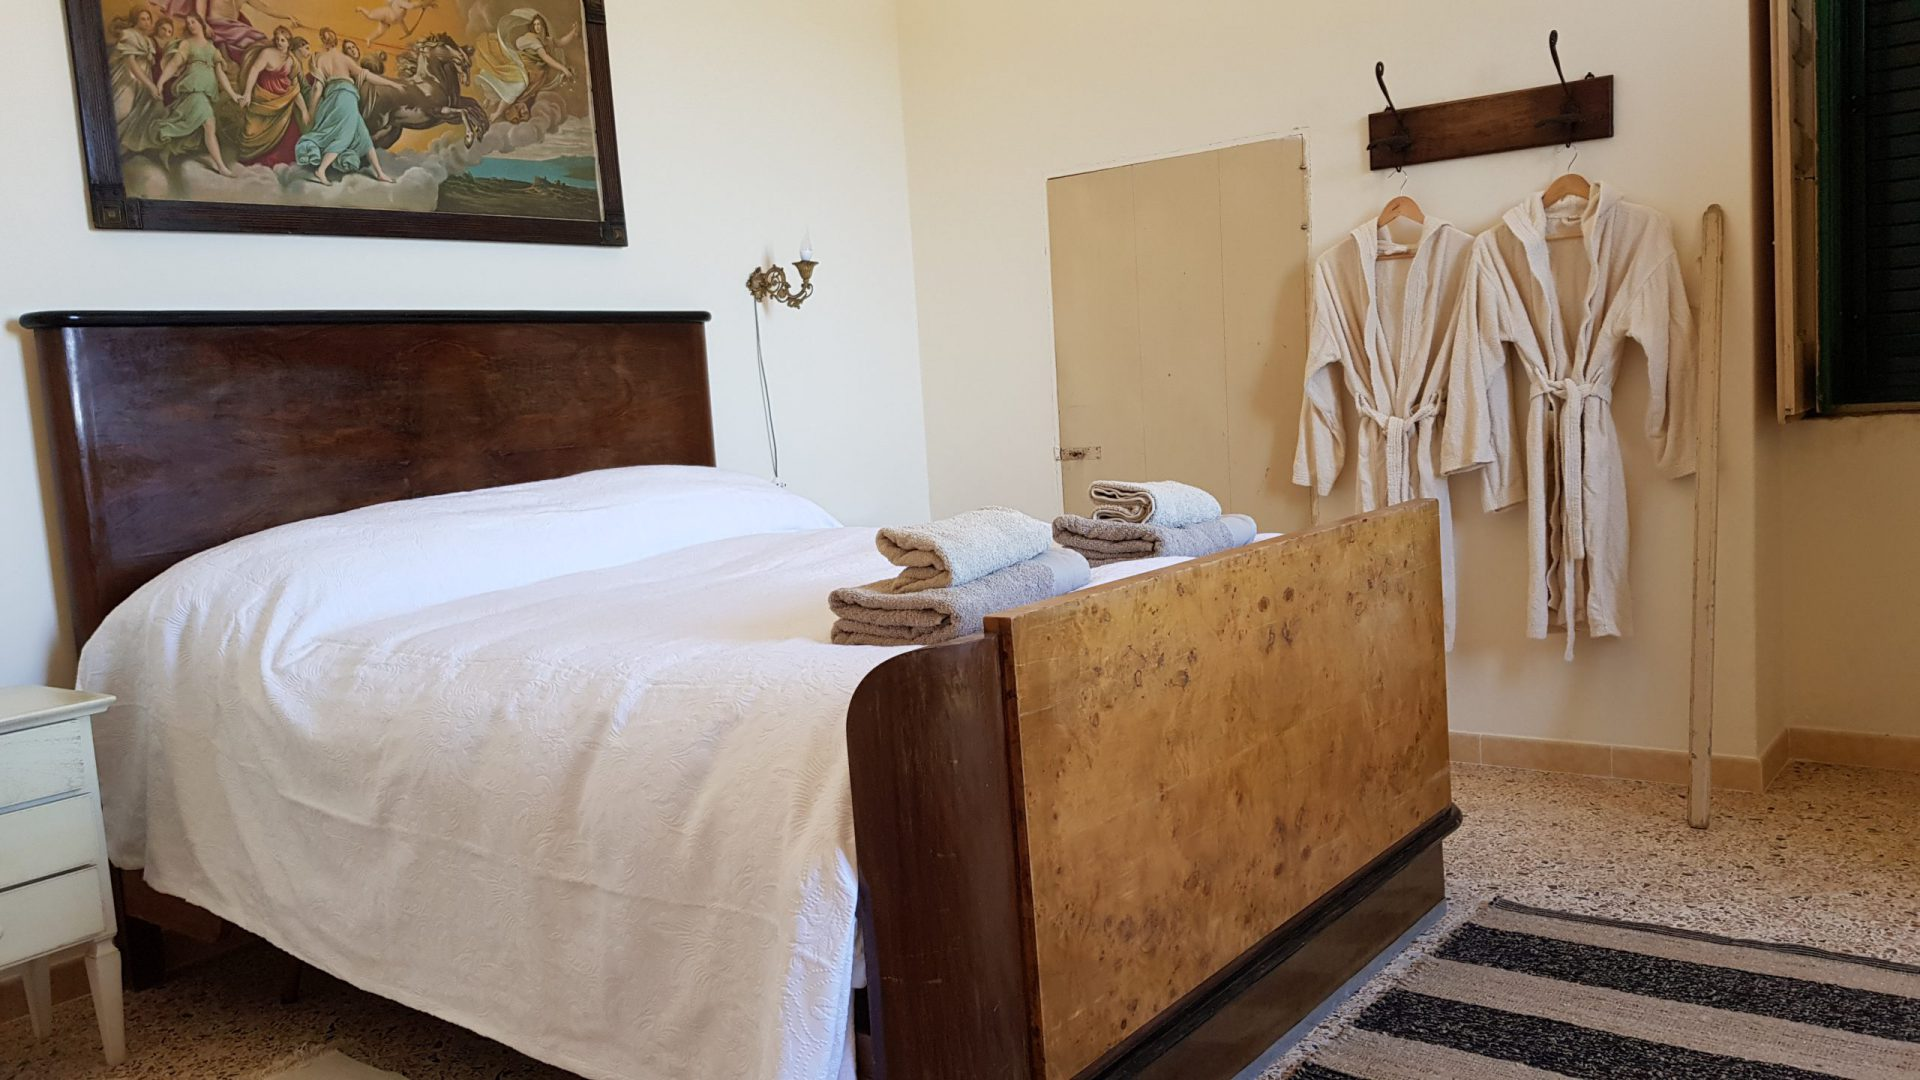 Queen size bedroom in Masseria Bellavista Ostuni Vacation holiday rental villa in Puglia with pool and seaview